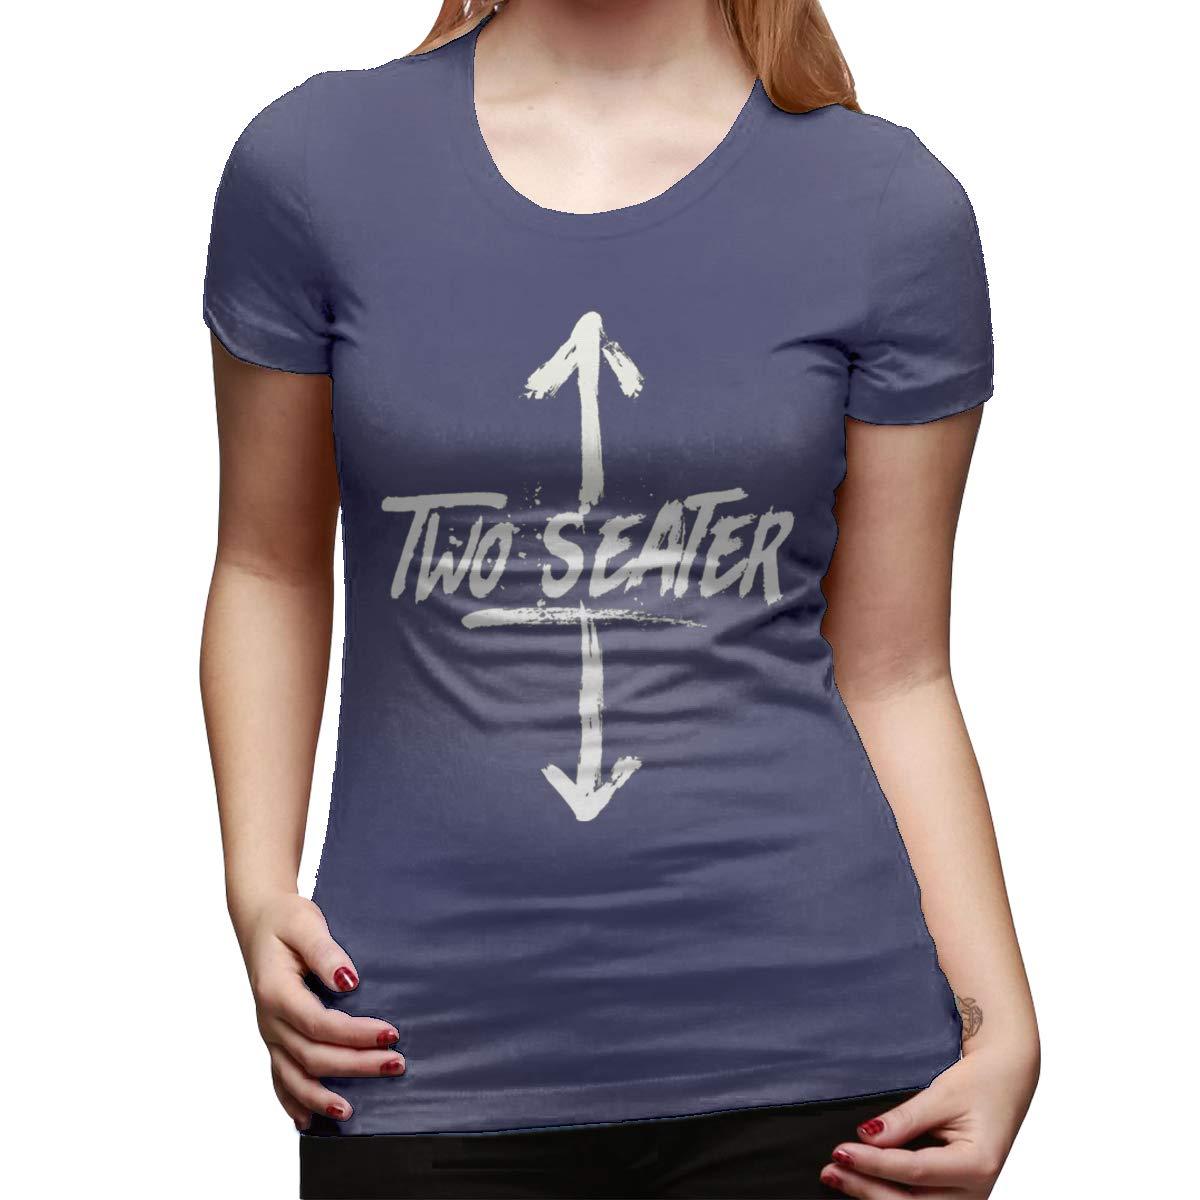 Nagetive Two Seater Tee Fashion T Shirt 9513